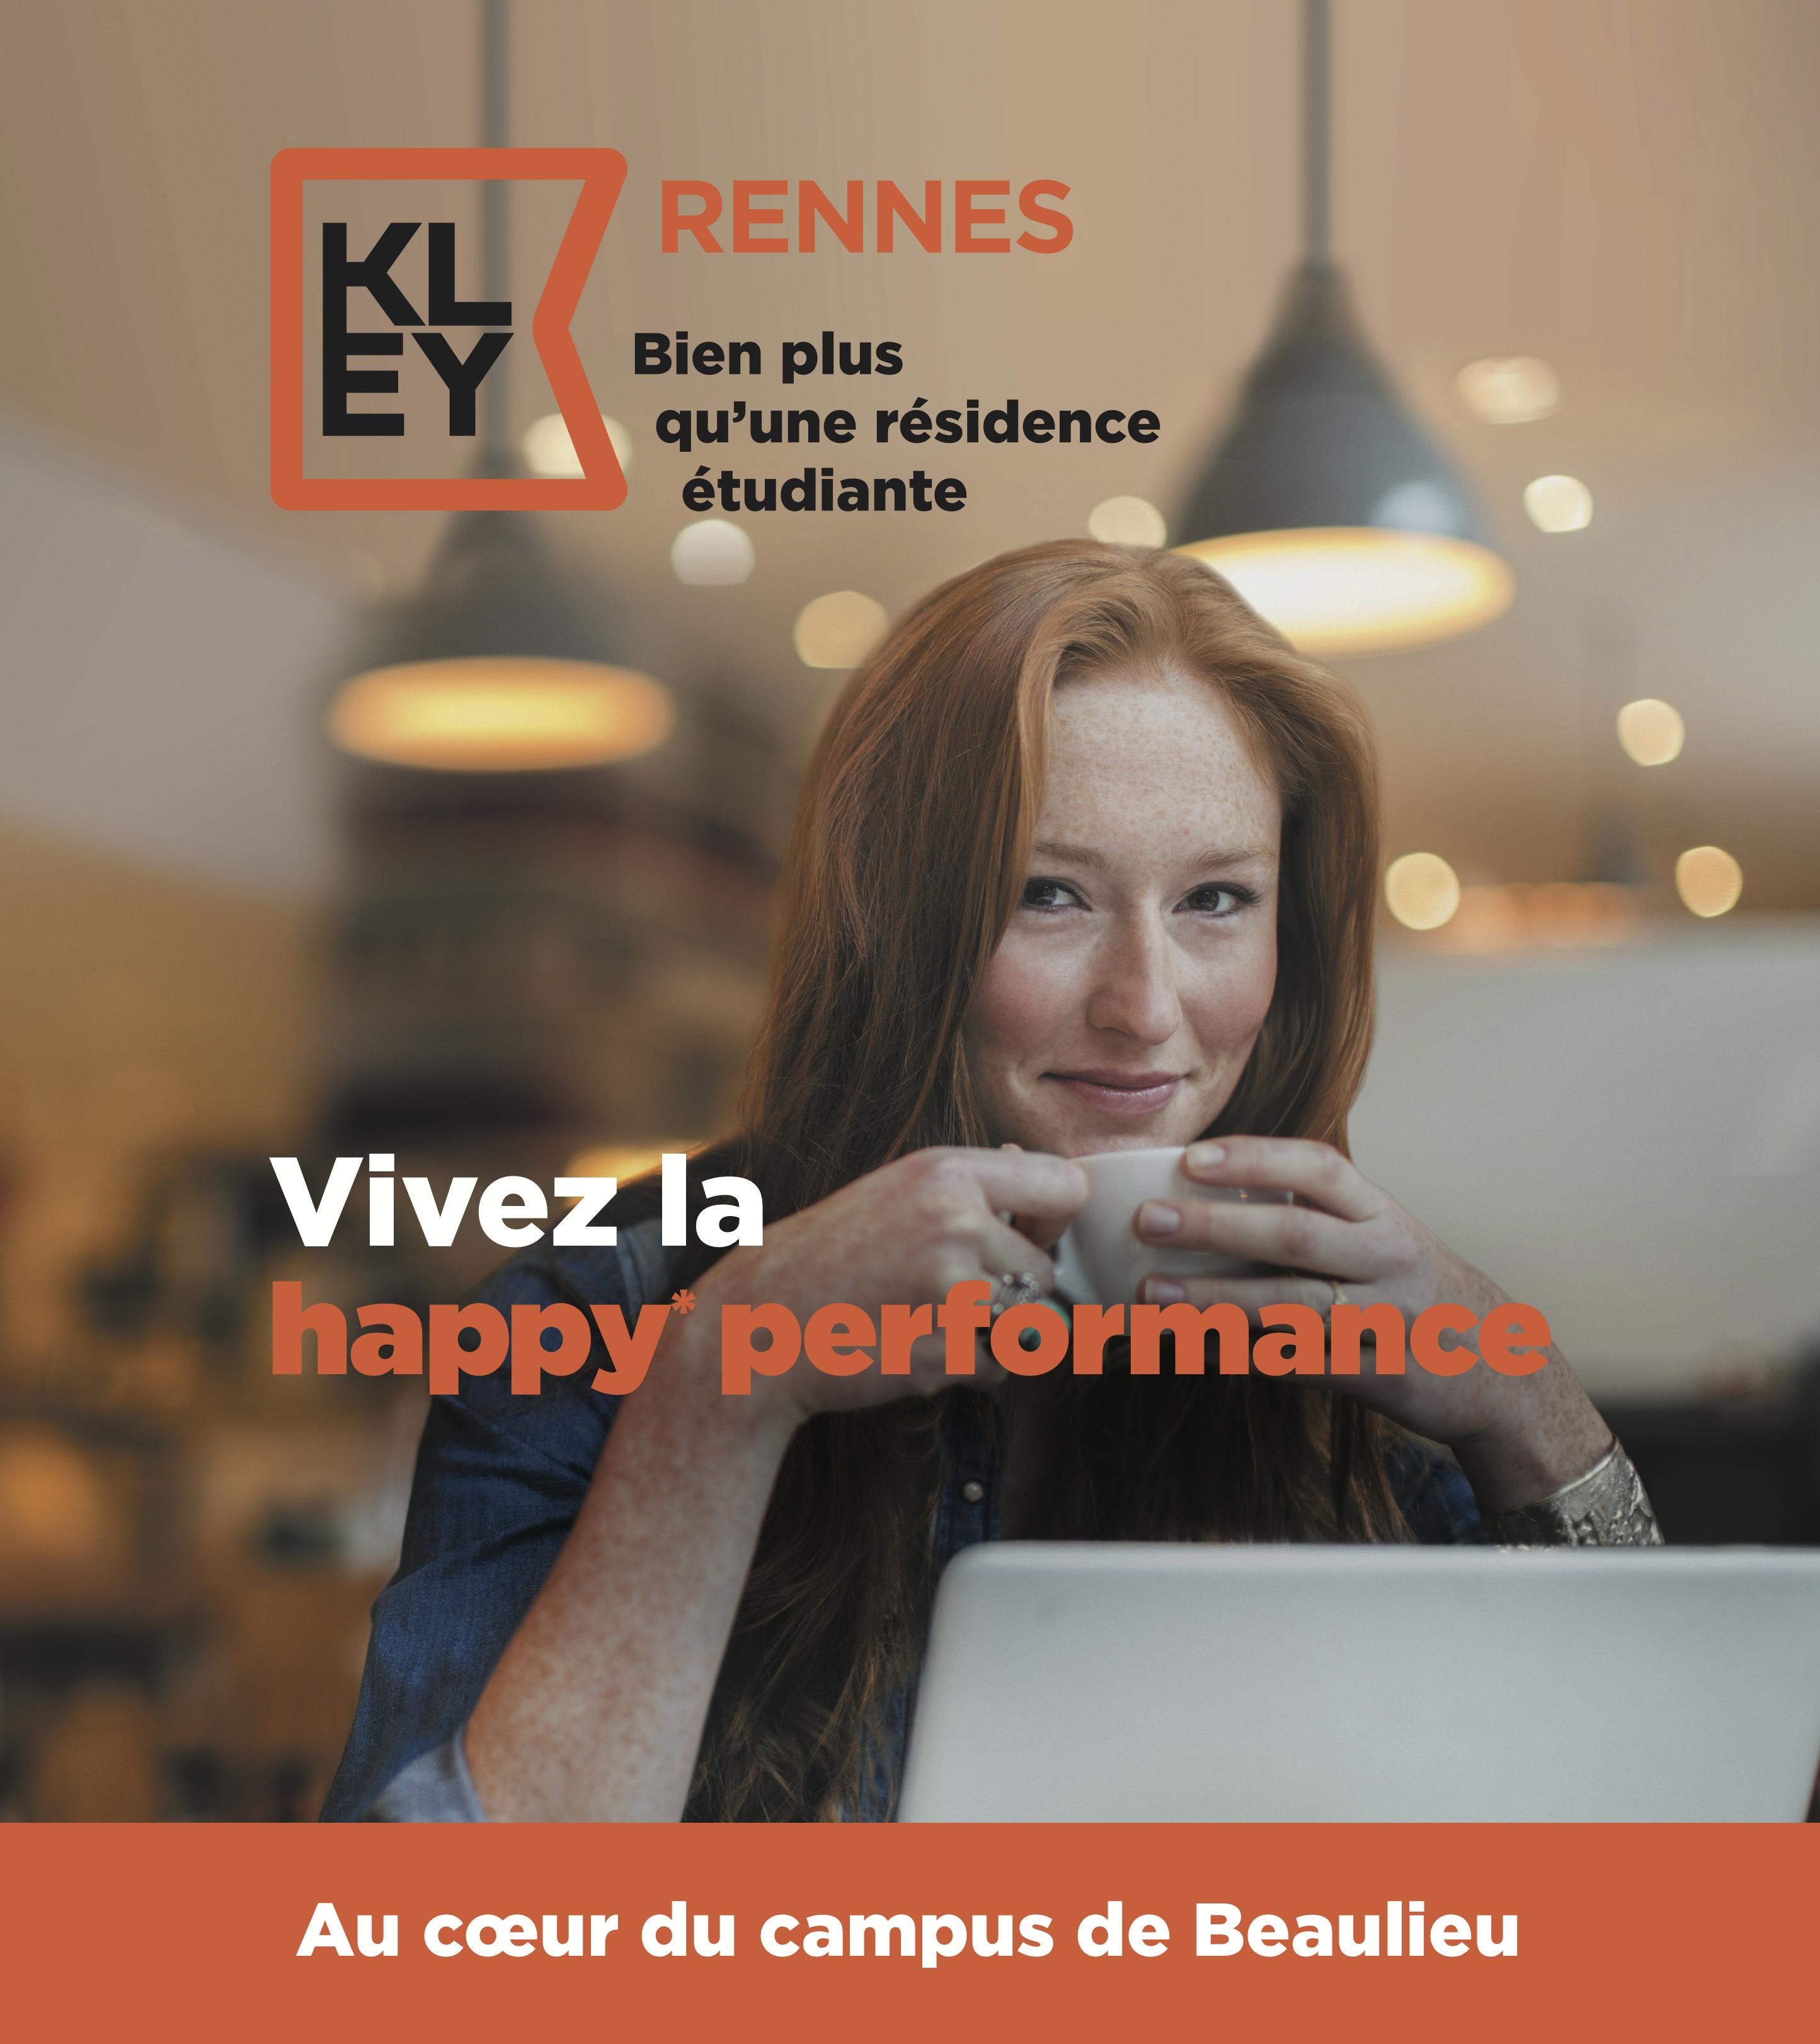 KLEY – RENNES